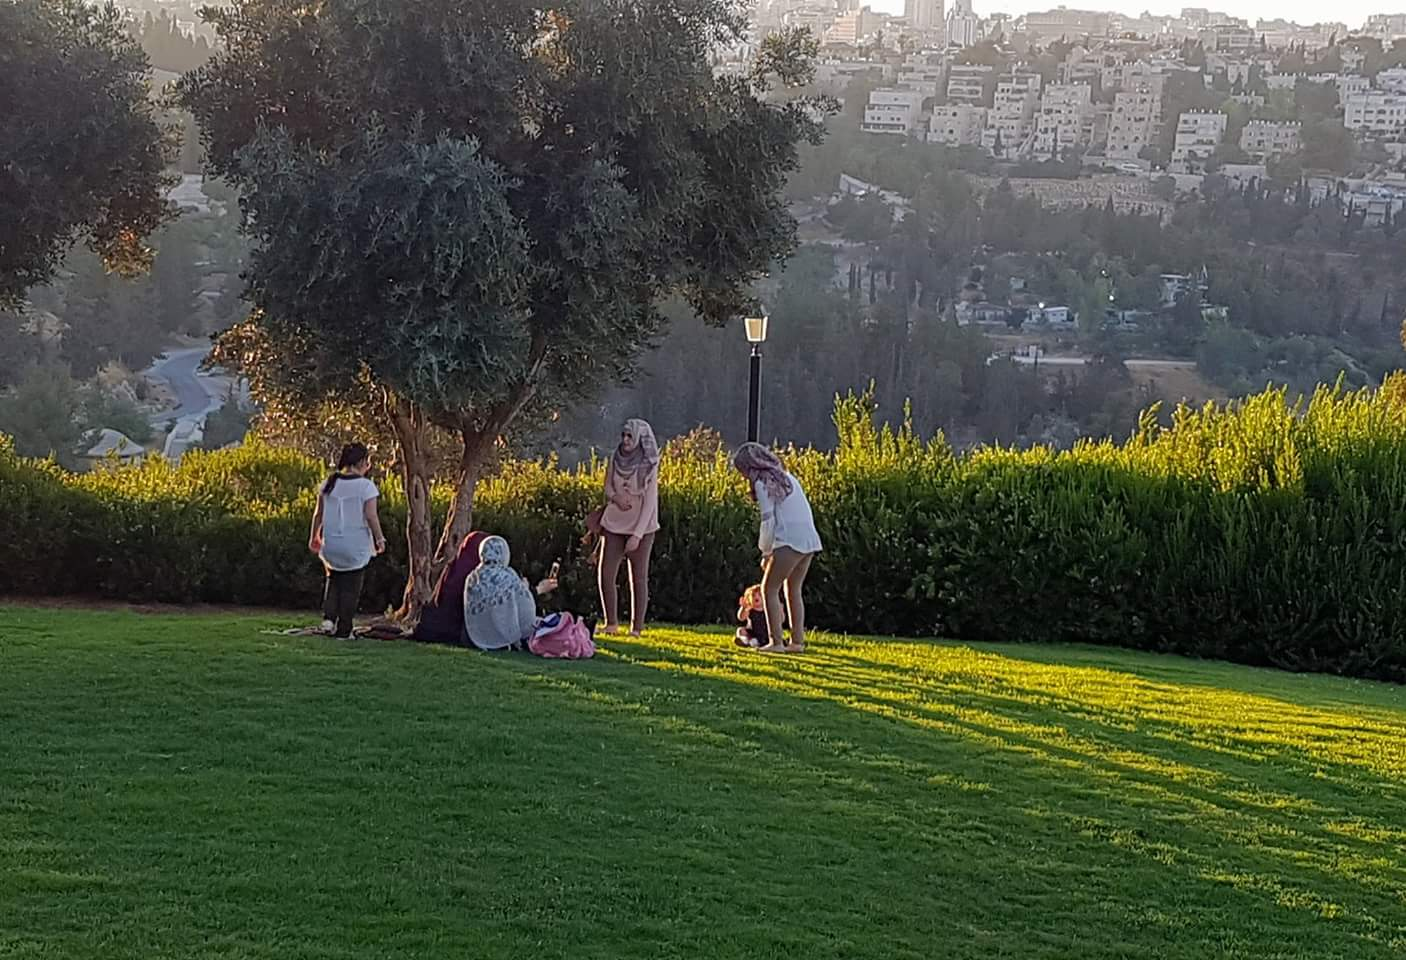 Picnic at the promenade (Courtesy: Karyn Stiefel Blass)